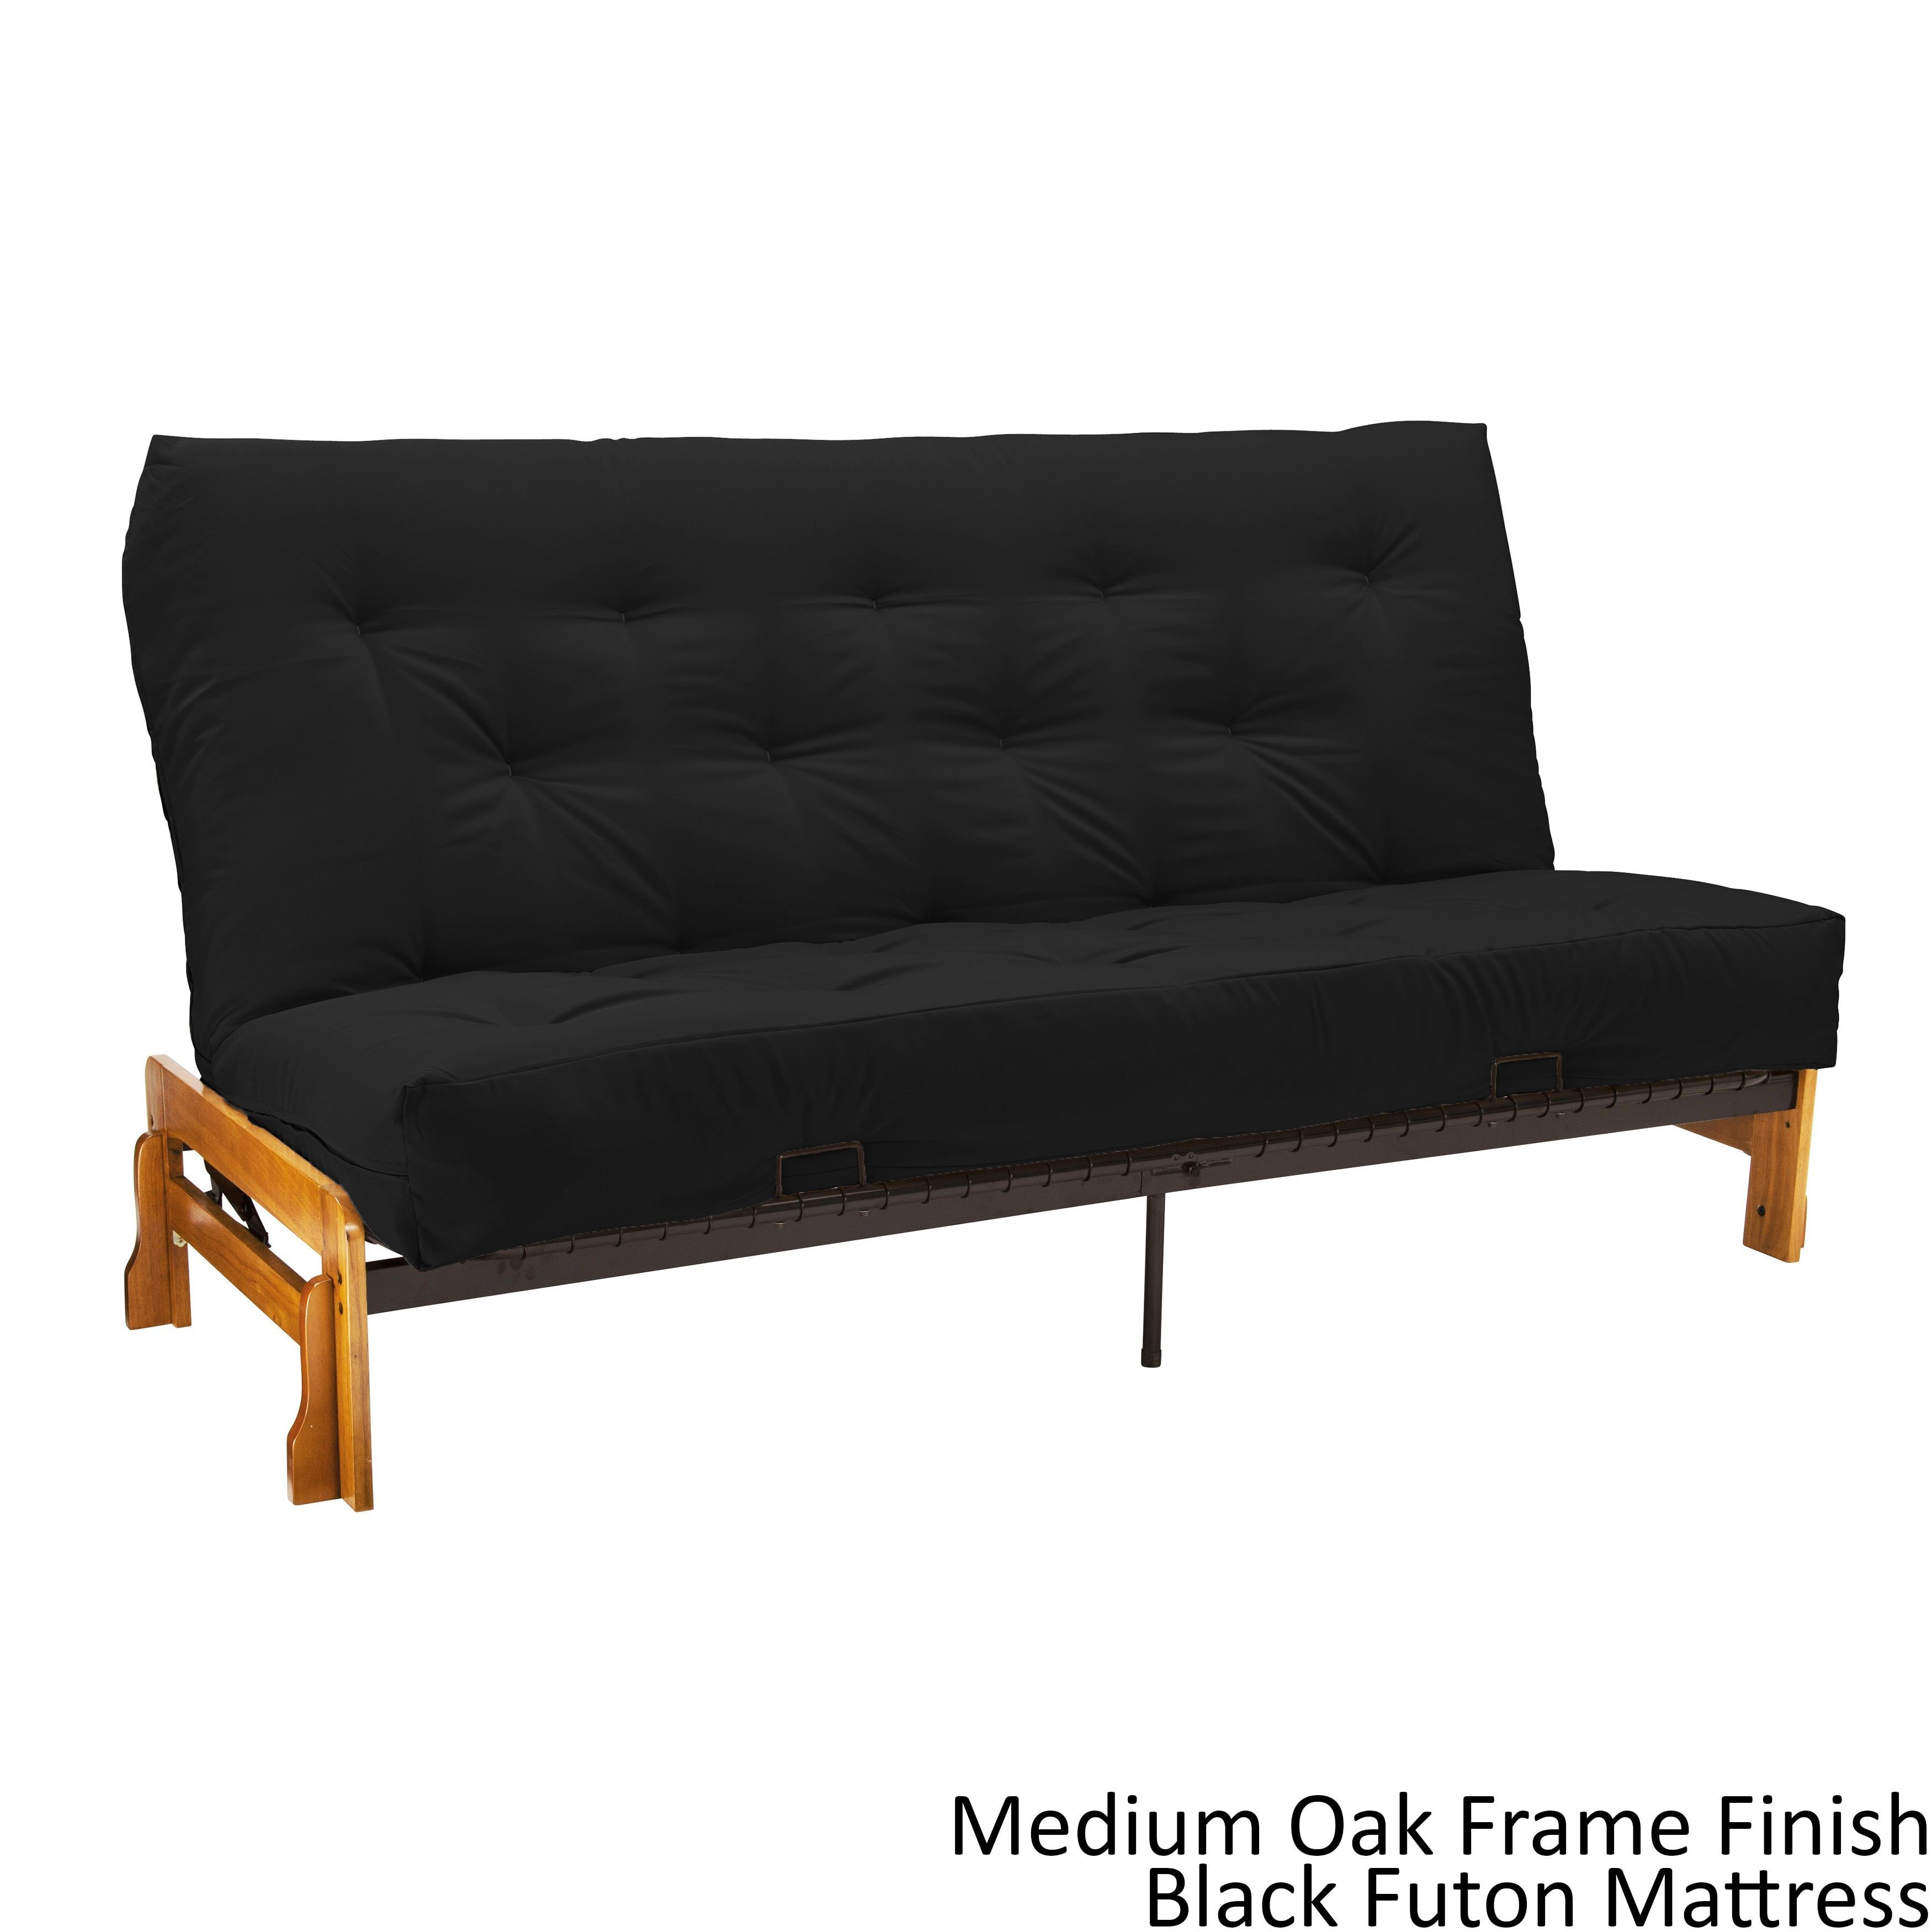 epicfurnishings boston armless futon frame  premier mattress set sleeper bed epicfurnishings boston queen armless futon frame  premier mattress      rh   pinterest